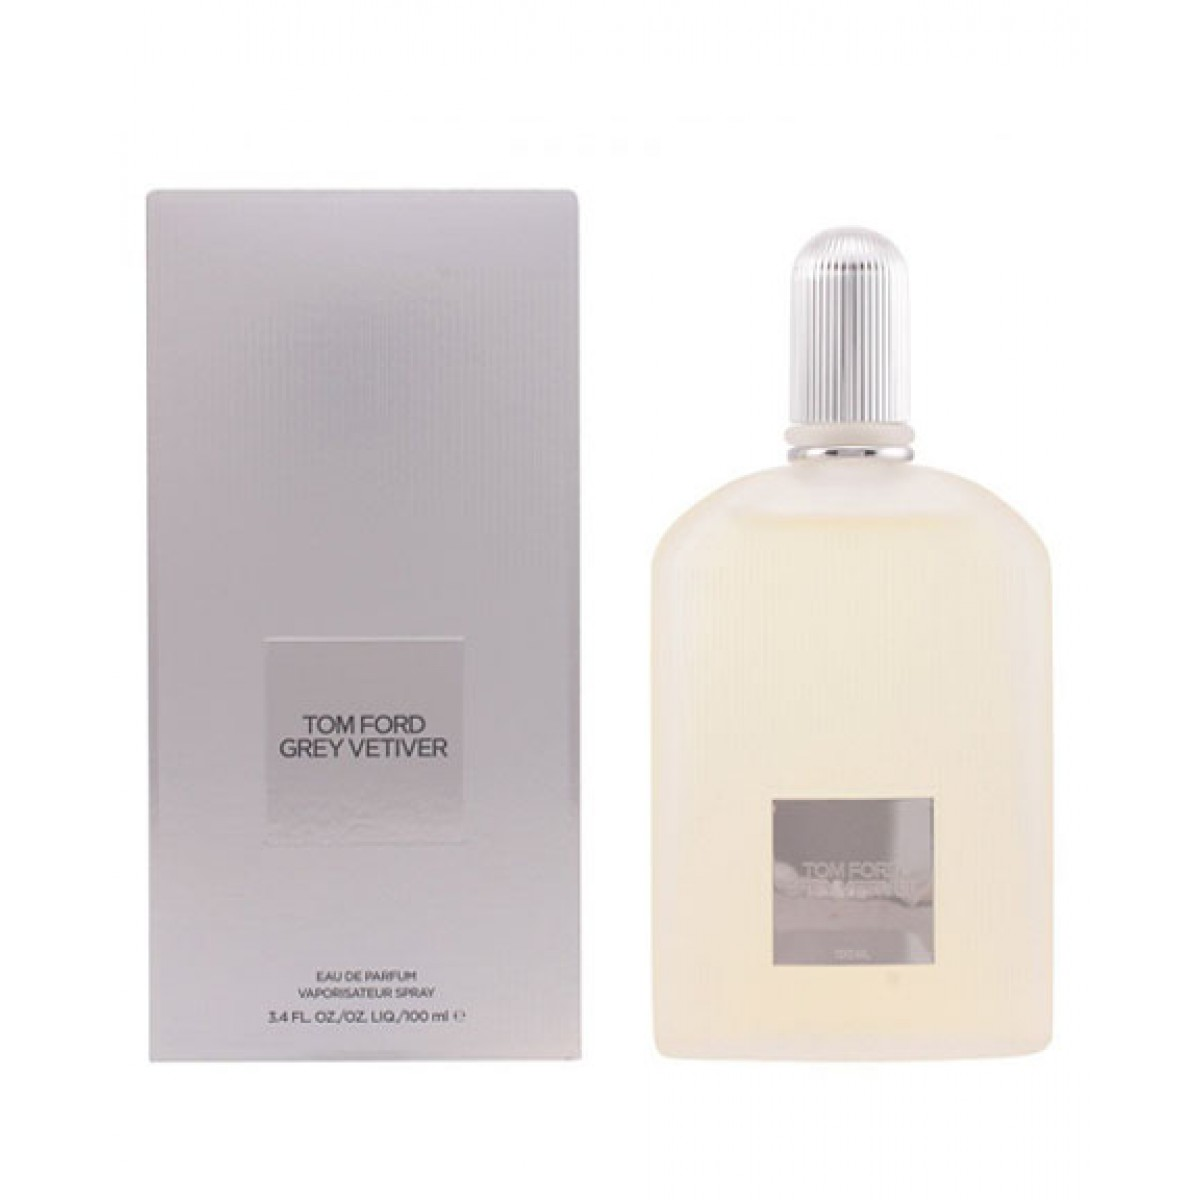 25736415a46b Tom Ford Grey Vetiver EDP Perfume Price in Pakistan